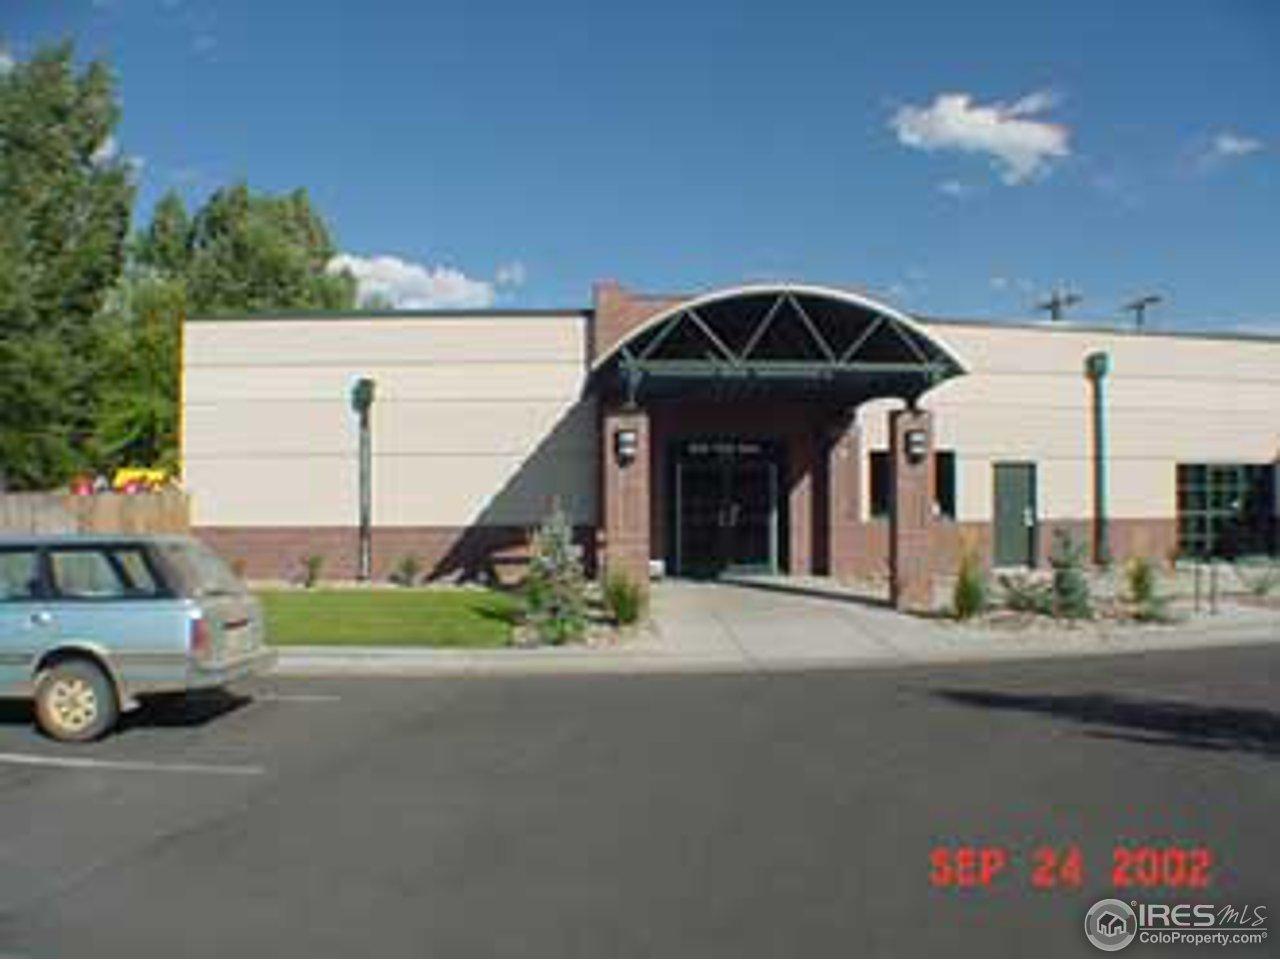 630 15th Ave 105, Longmont, CO 80501